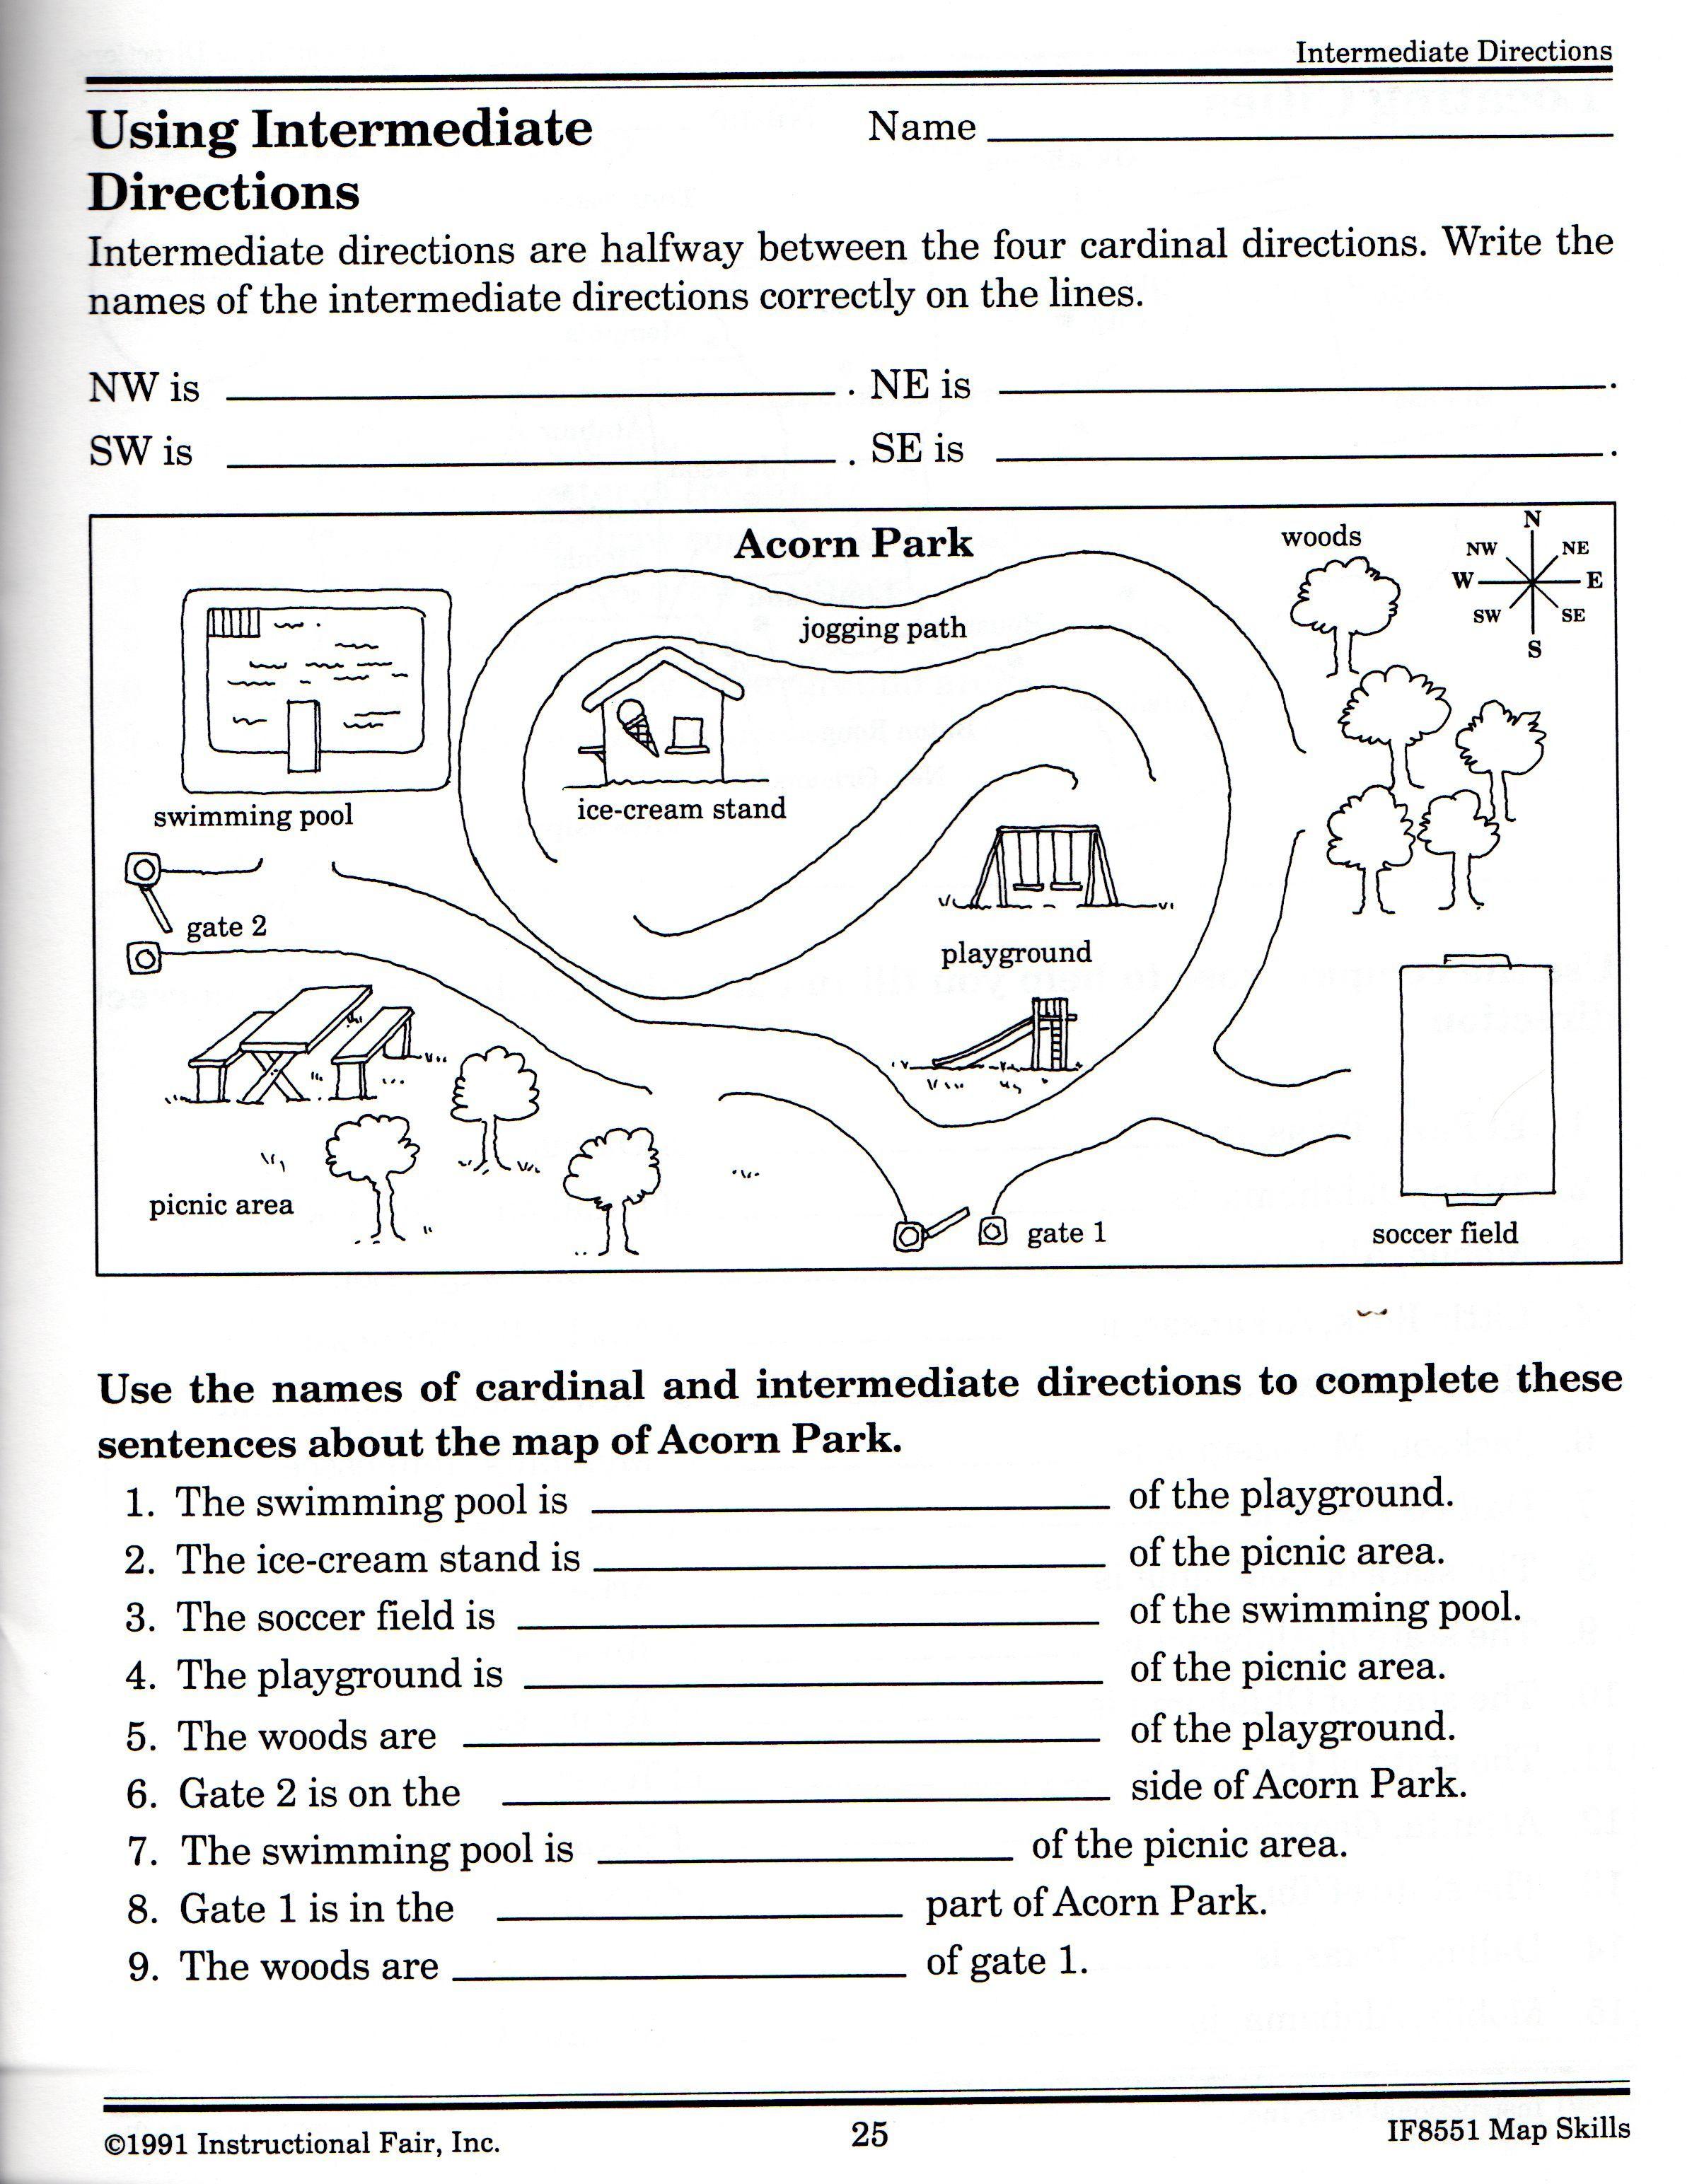 21 Awesome Following Directions Worksheet For You Https Bacamajalah Com 21 Awesome Fol In 2020 Map Skills Worksheets Geography Worksheets Social Studies Worksheets